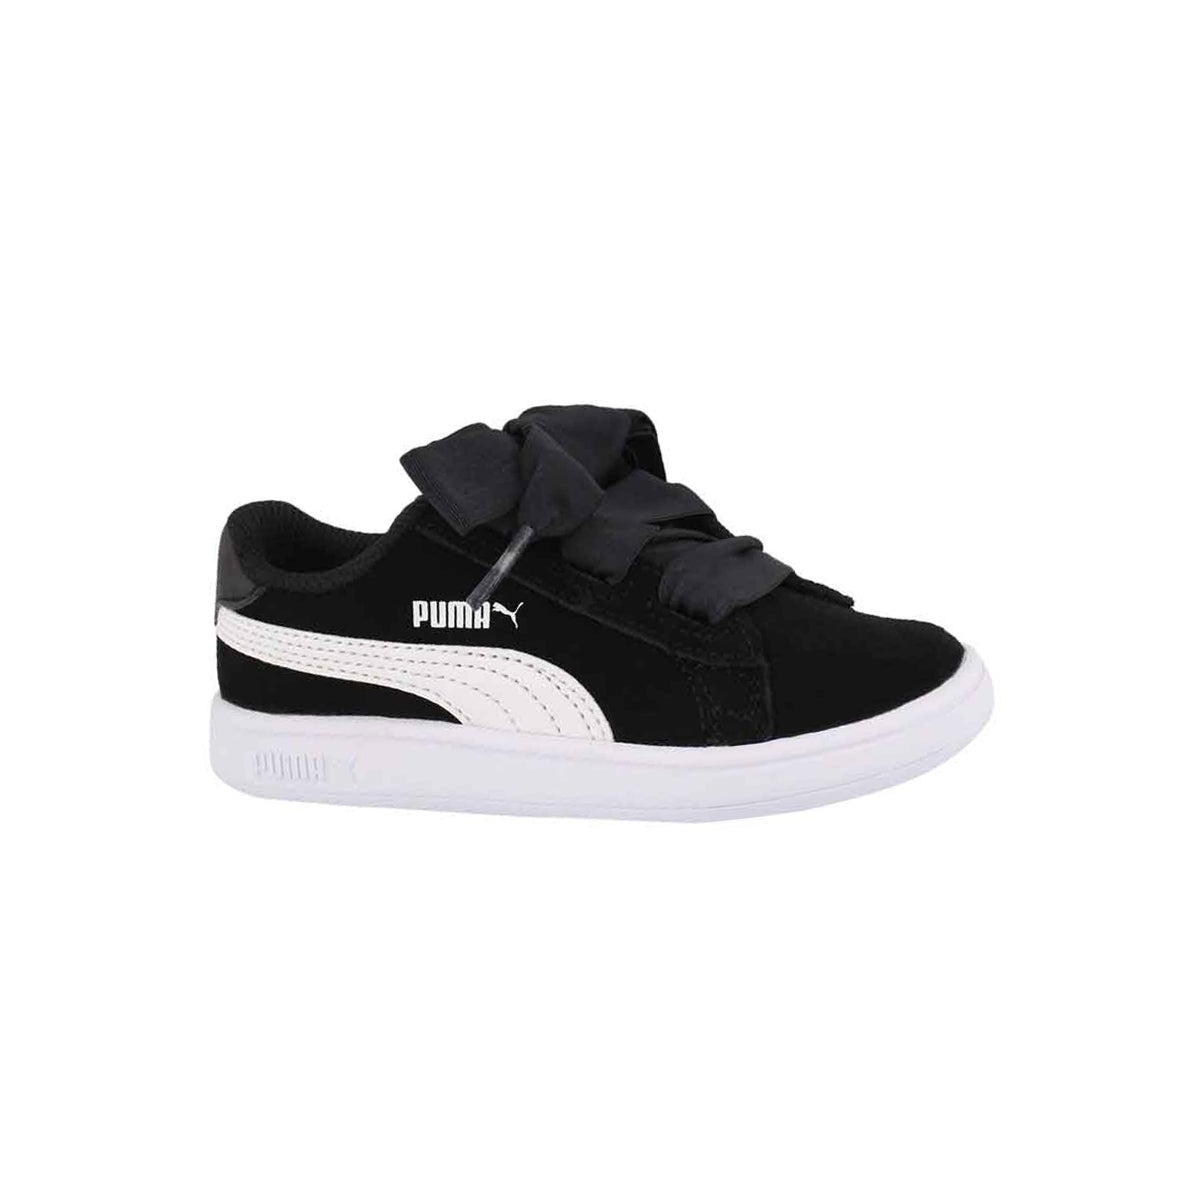 Infants' PUMA SMASH V2 RIBBON black/white sneakers